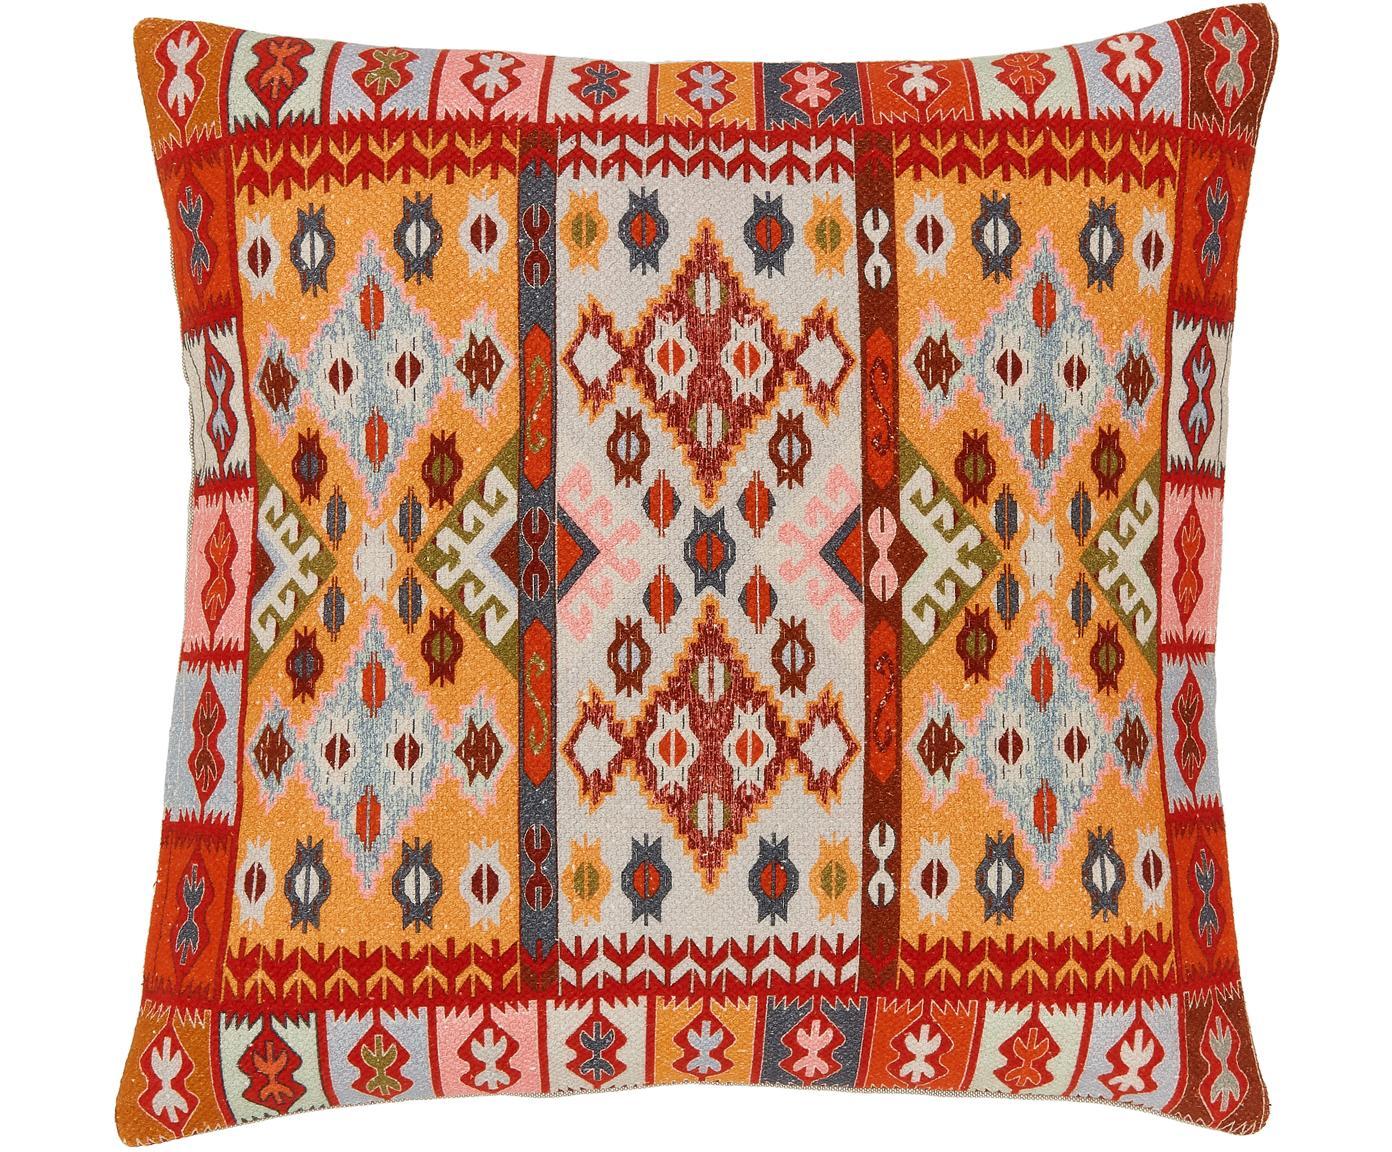 Federa arredo etnica Budak, Cotone, Multicolore, Larg. 45 x Lung. 45 cm